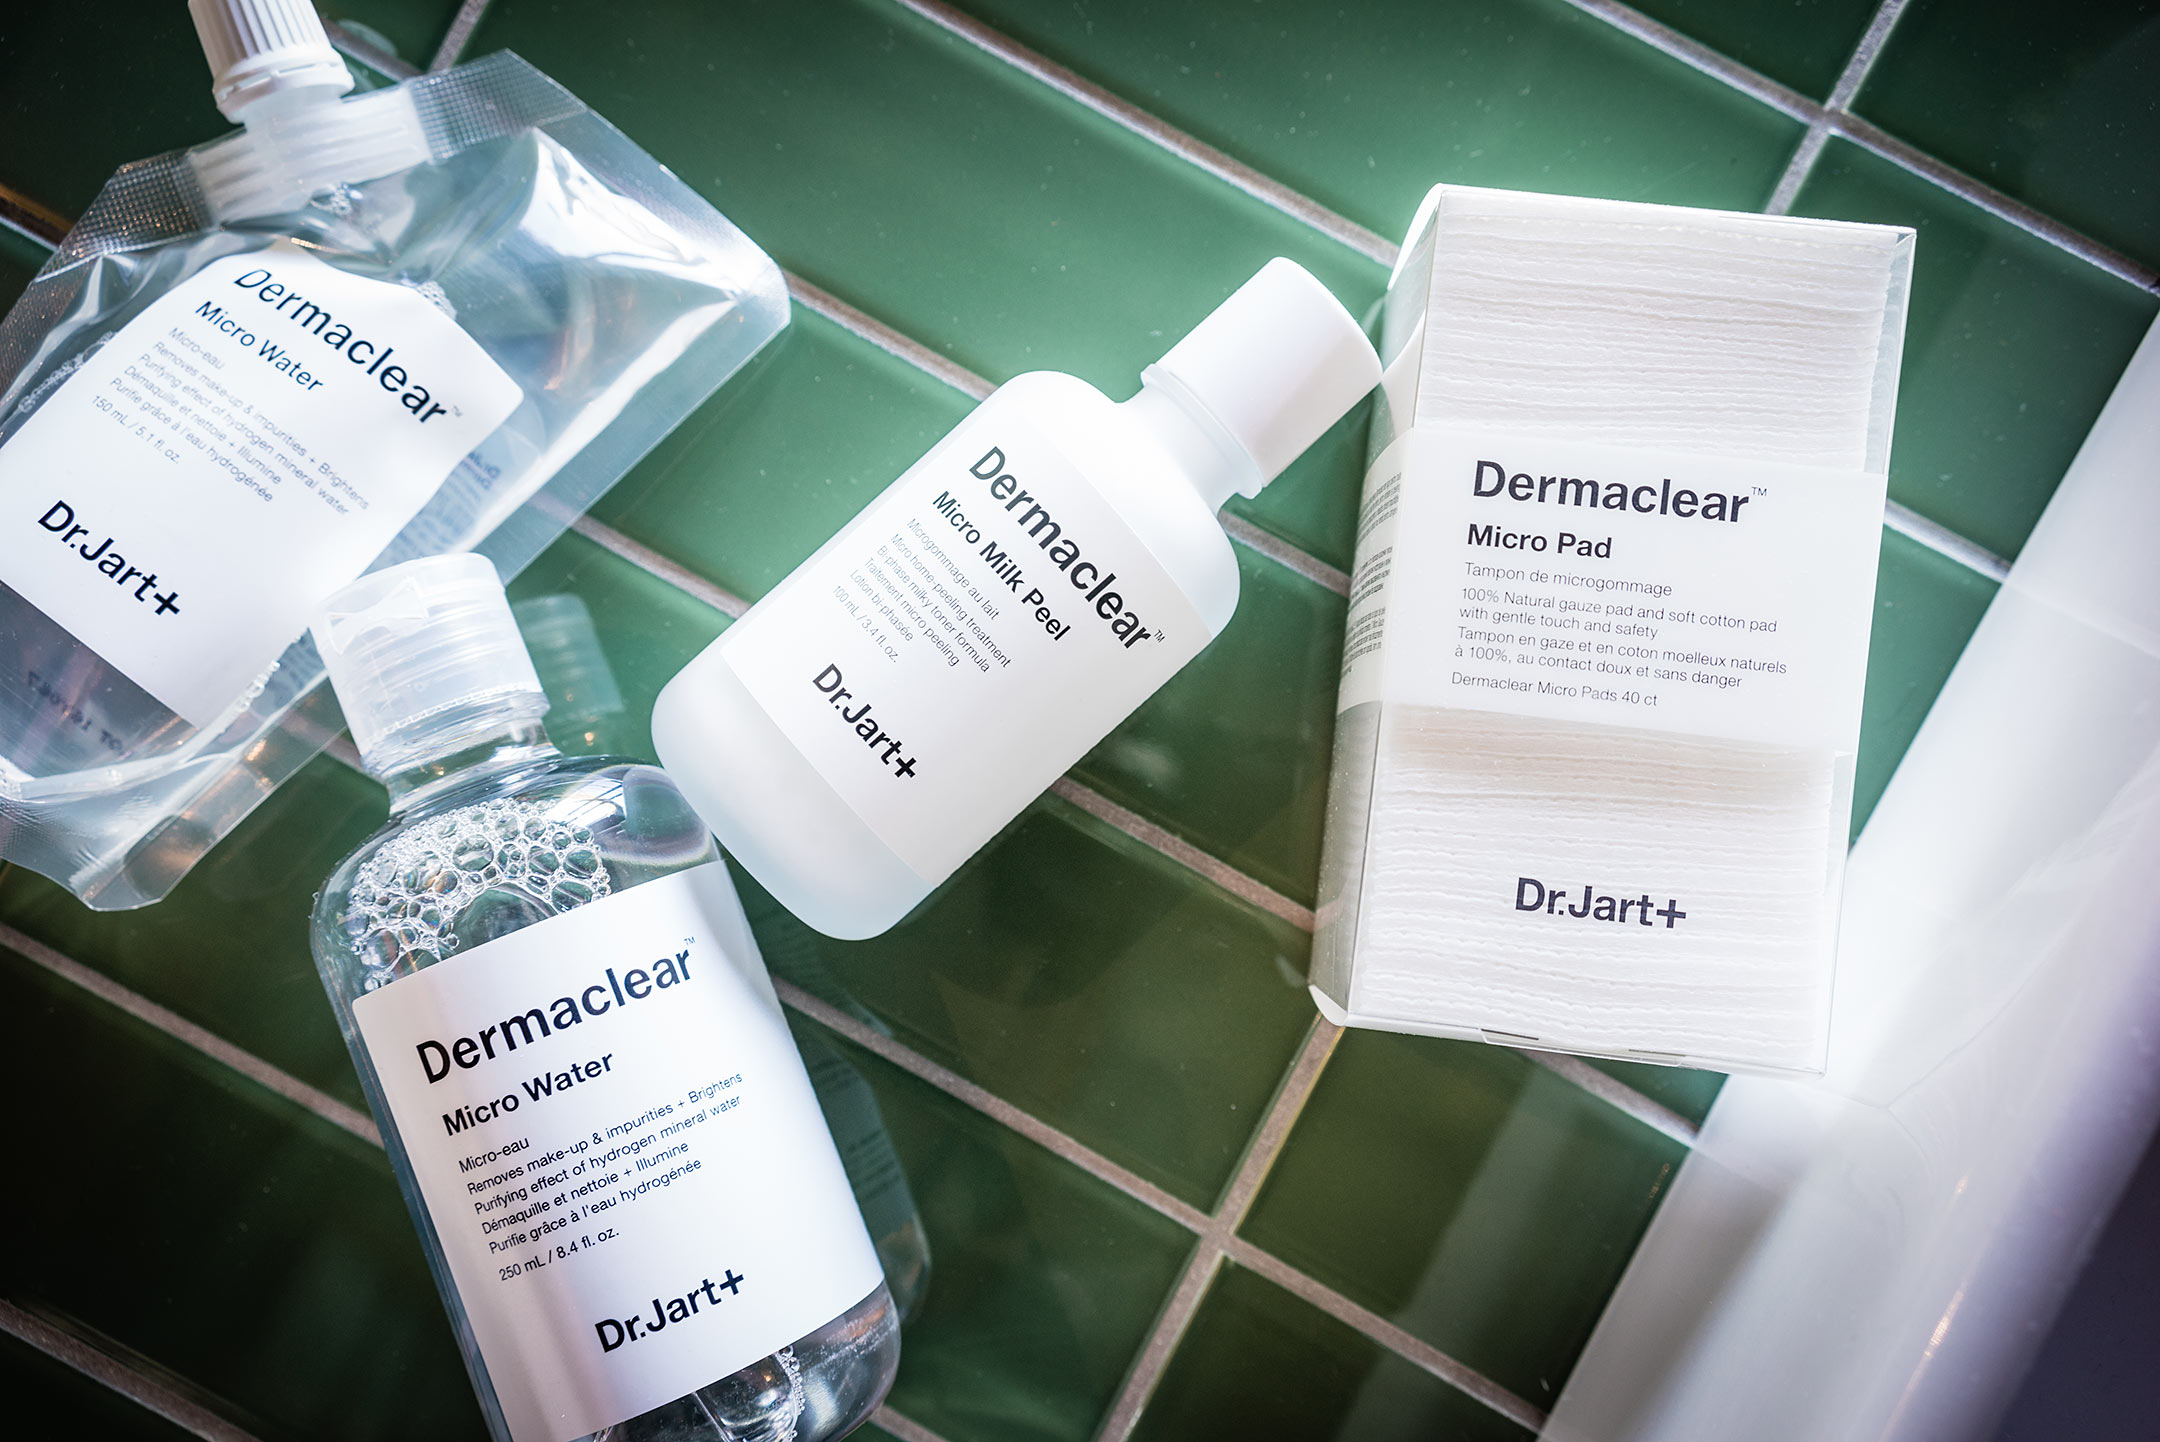 Dr. Jart+ Gesichtswasser Dermaclear Micro Water Beauty Blog Sunnyinga